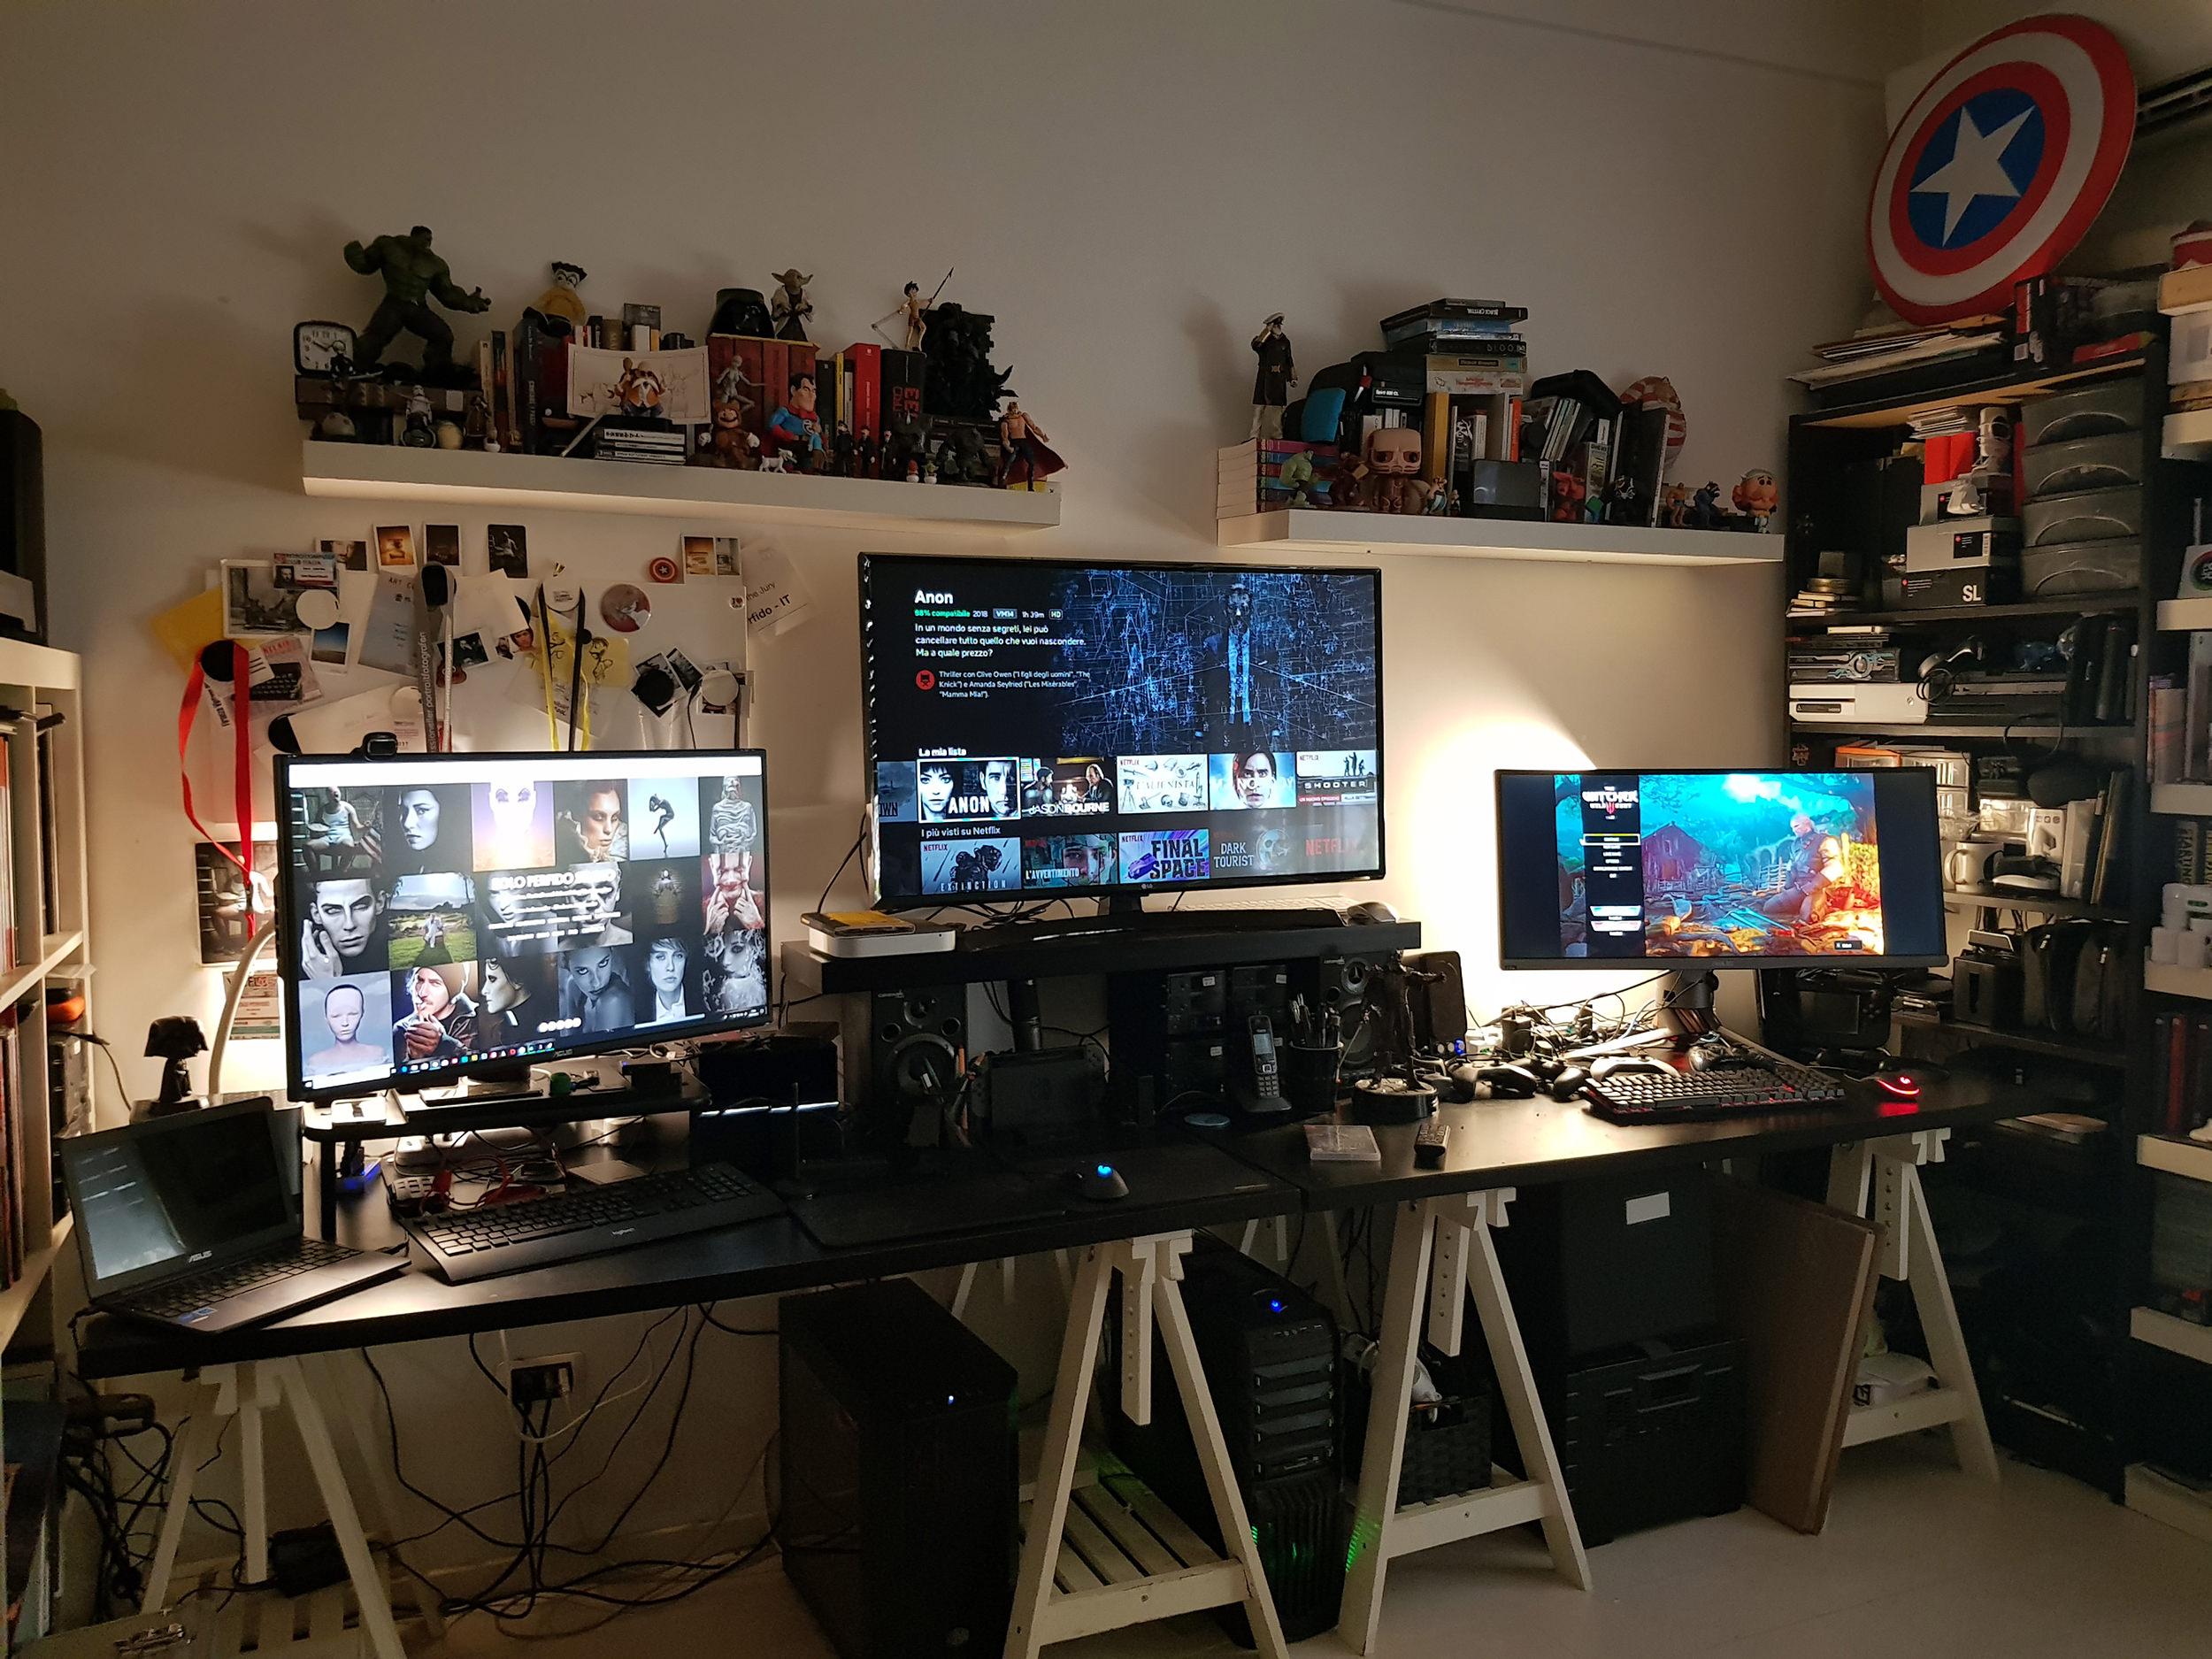 eolo-perfido-home-studio.jpg.jpg